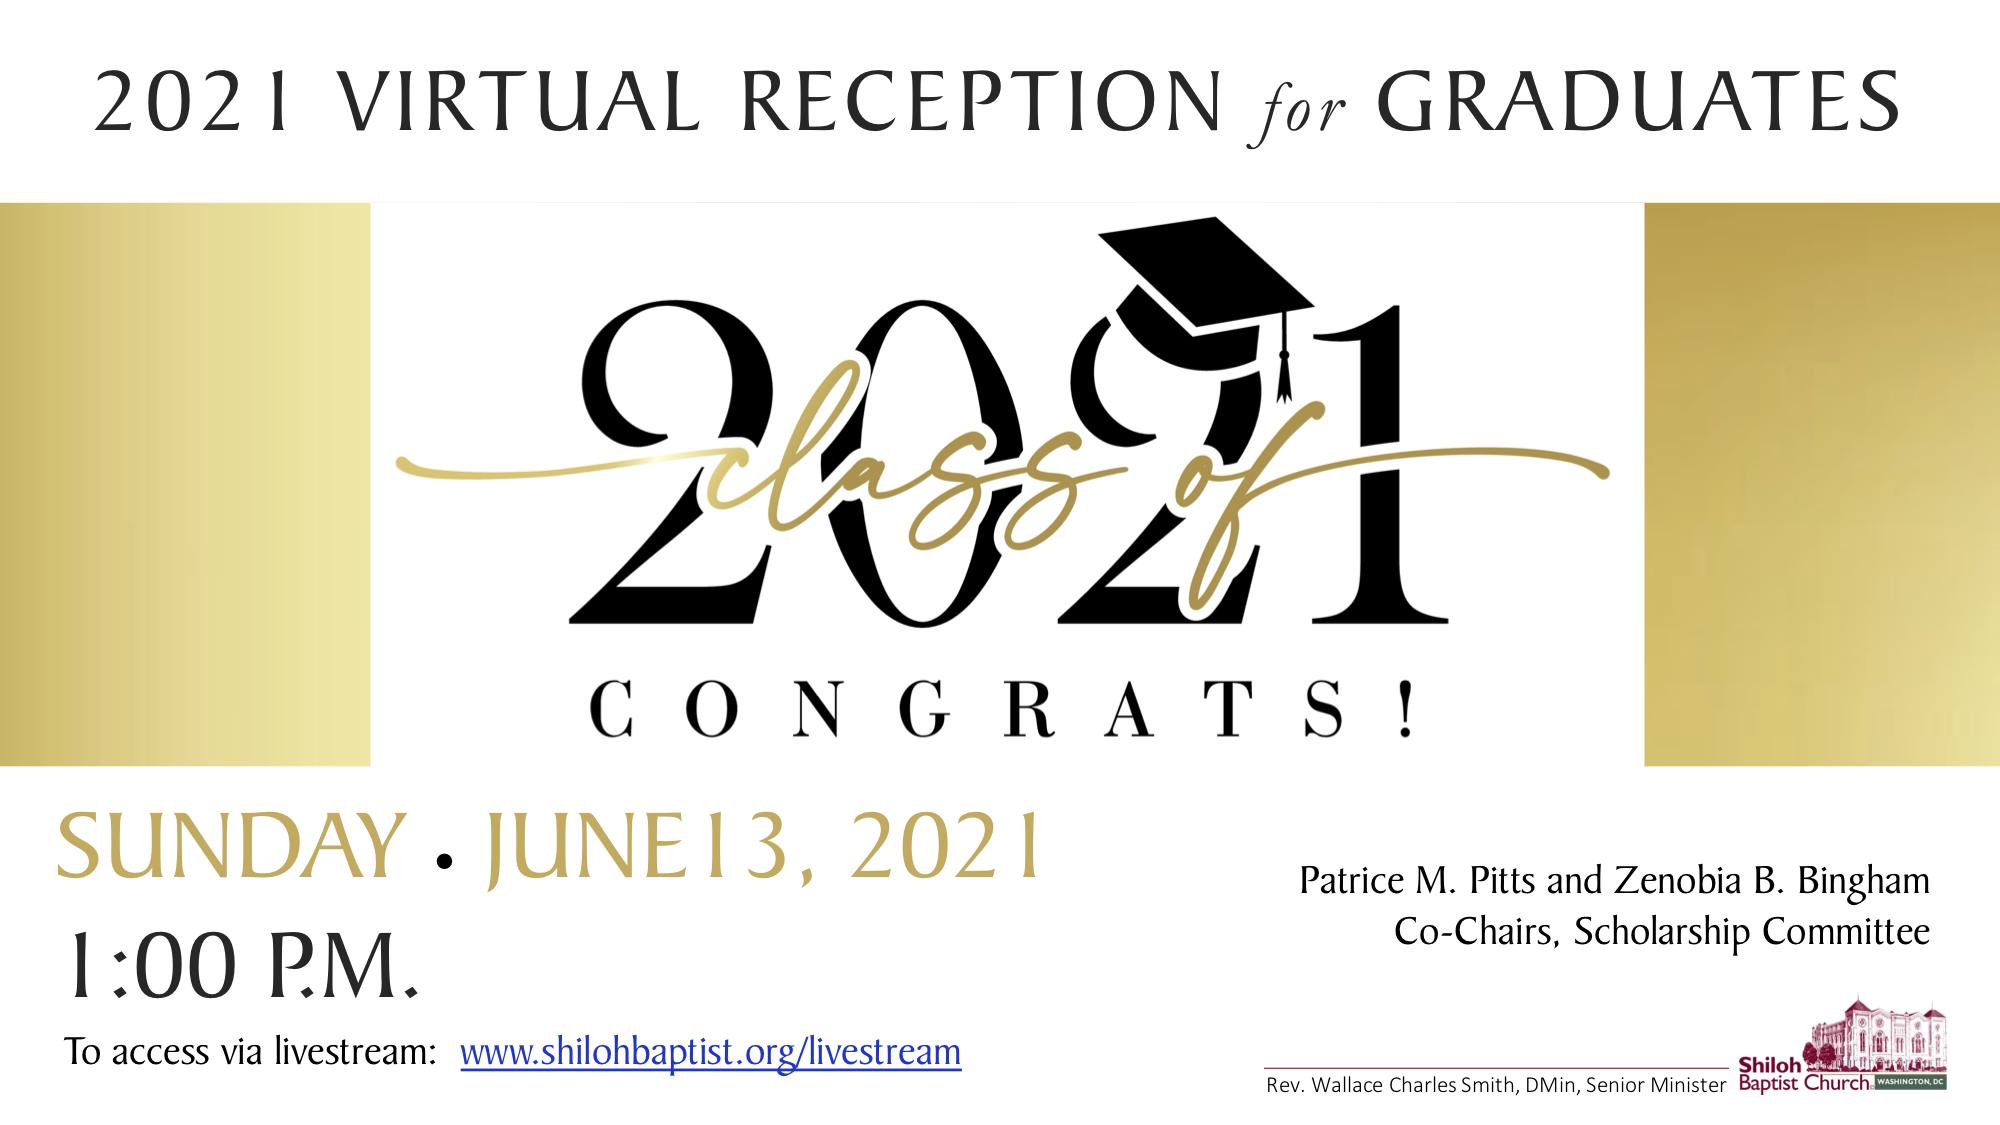 2021 Reception for Graduates